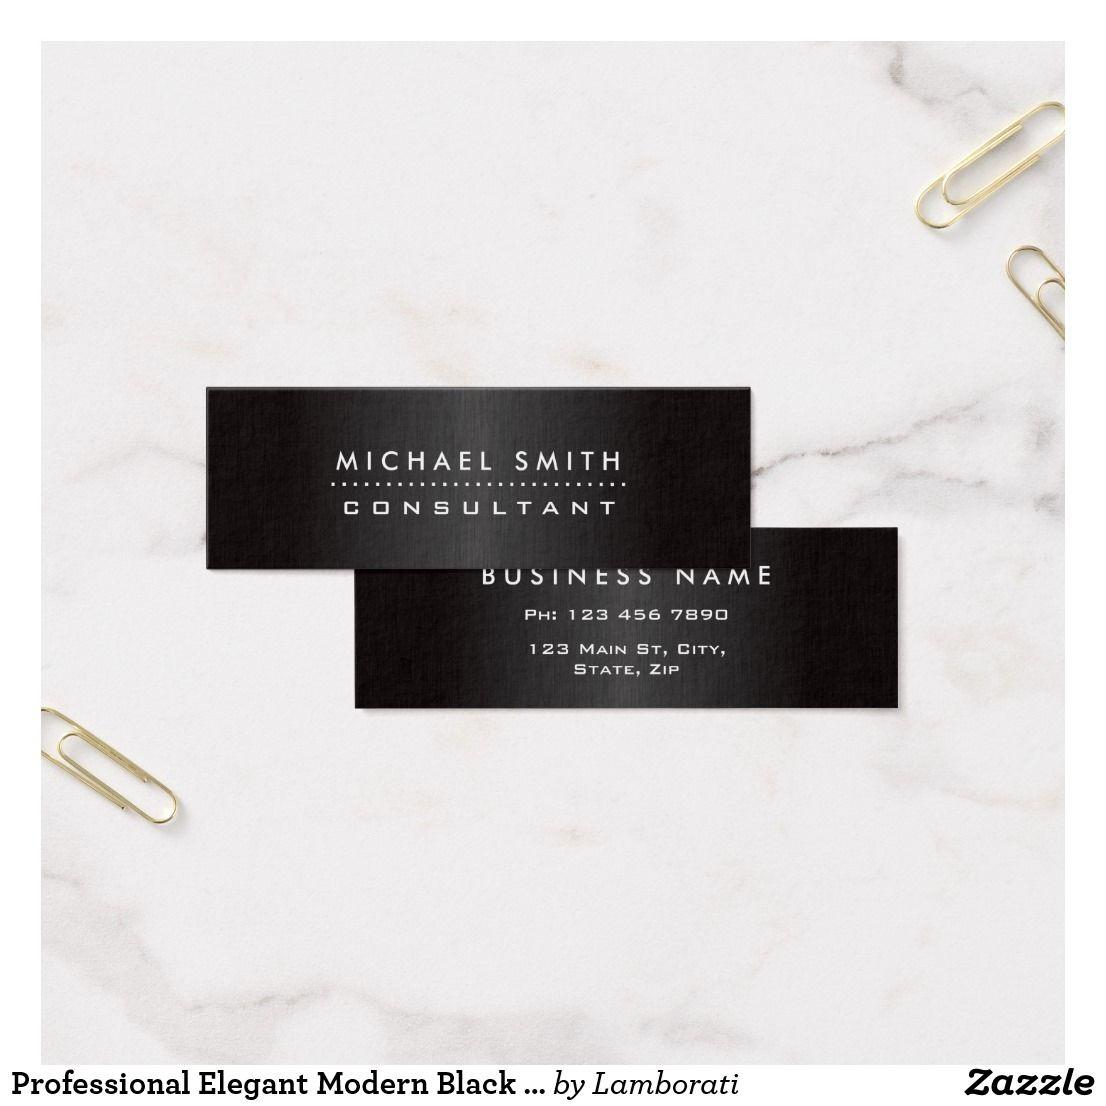 Professional Elegant Modern Black Brushed Metal Mini Business Card ...